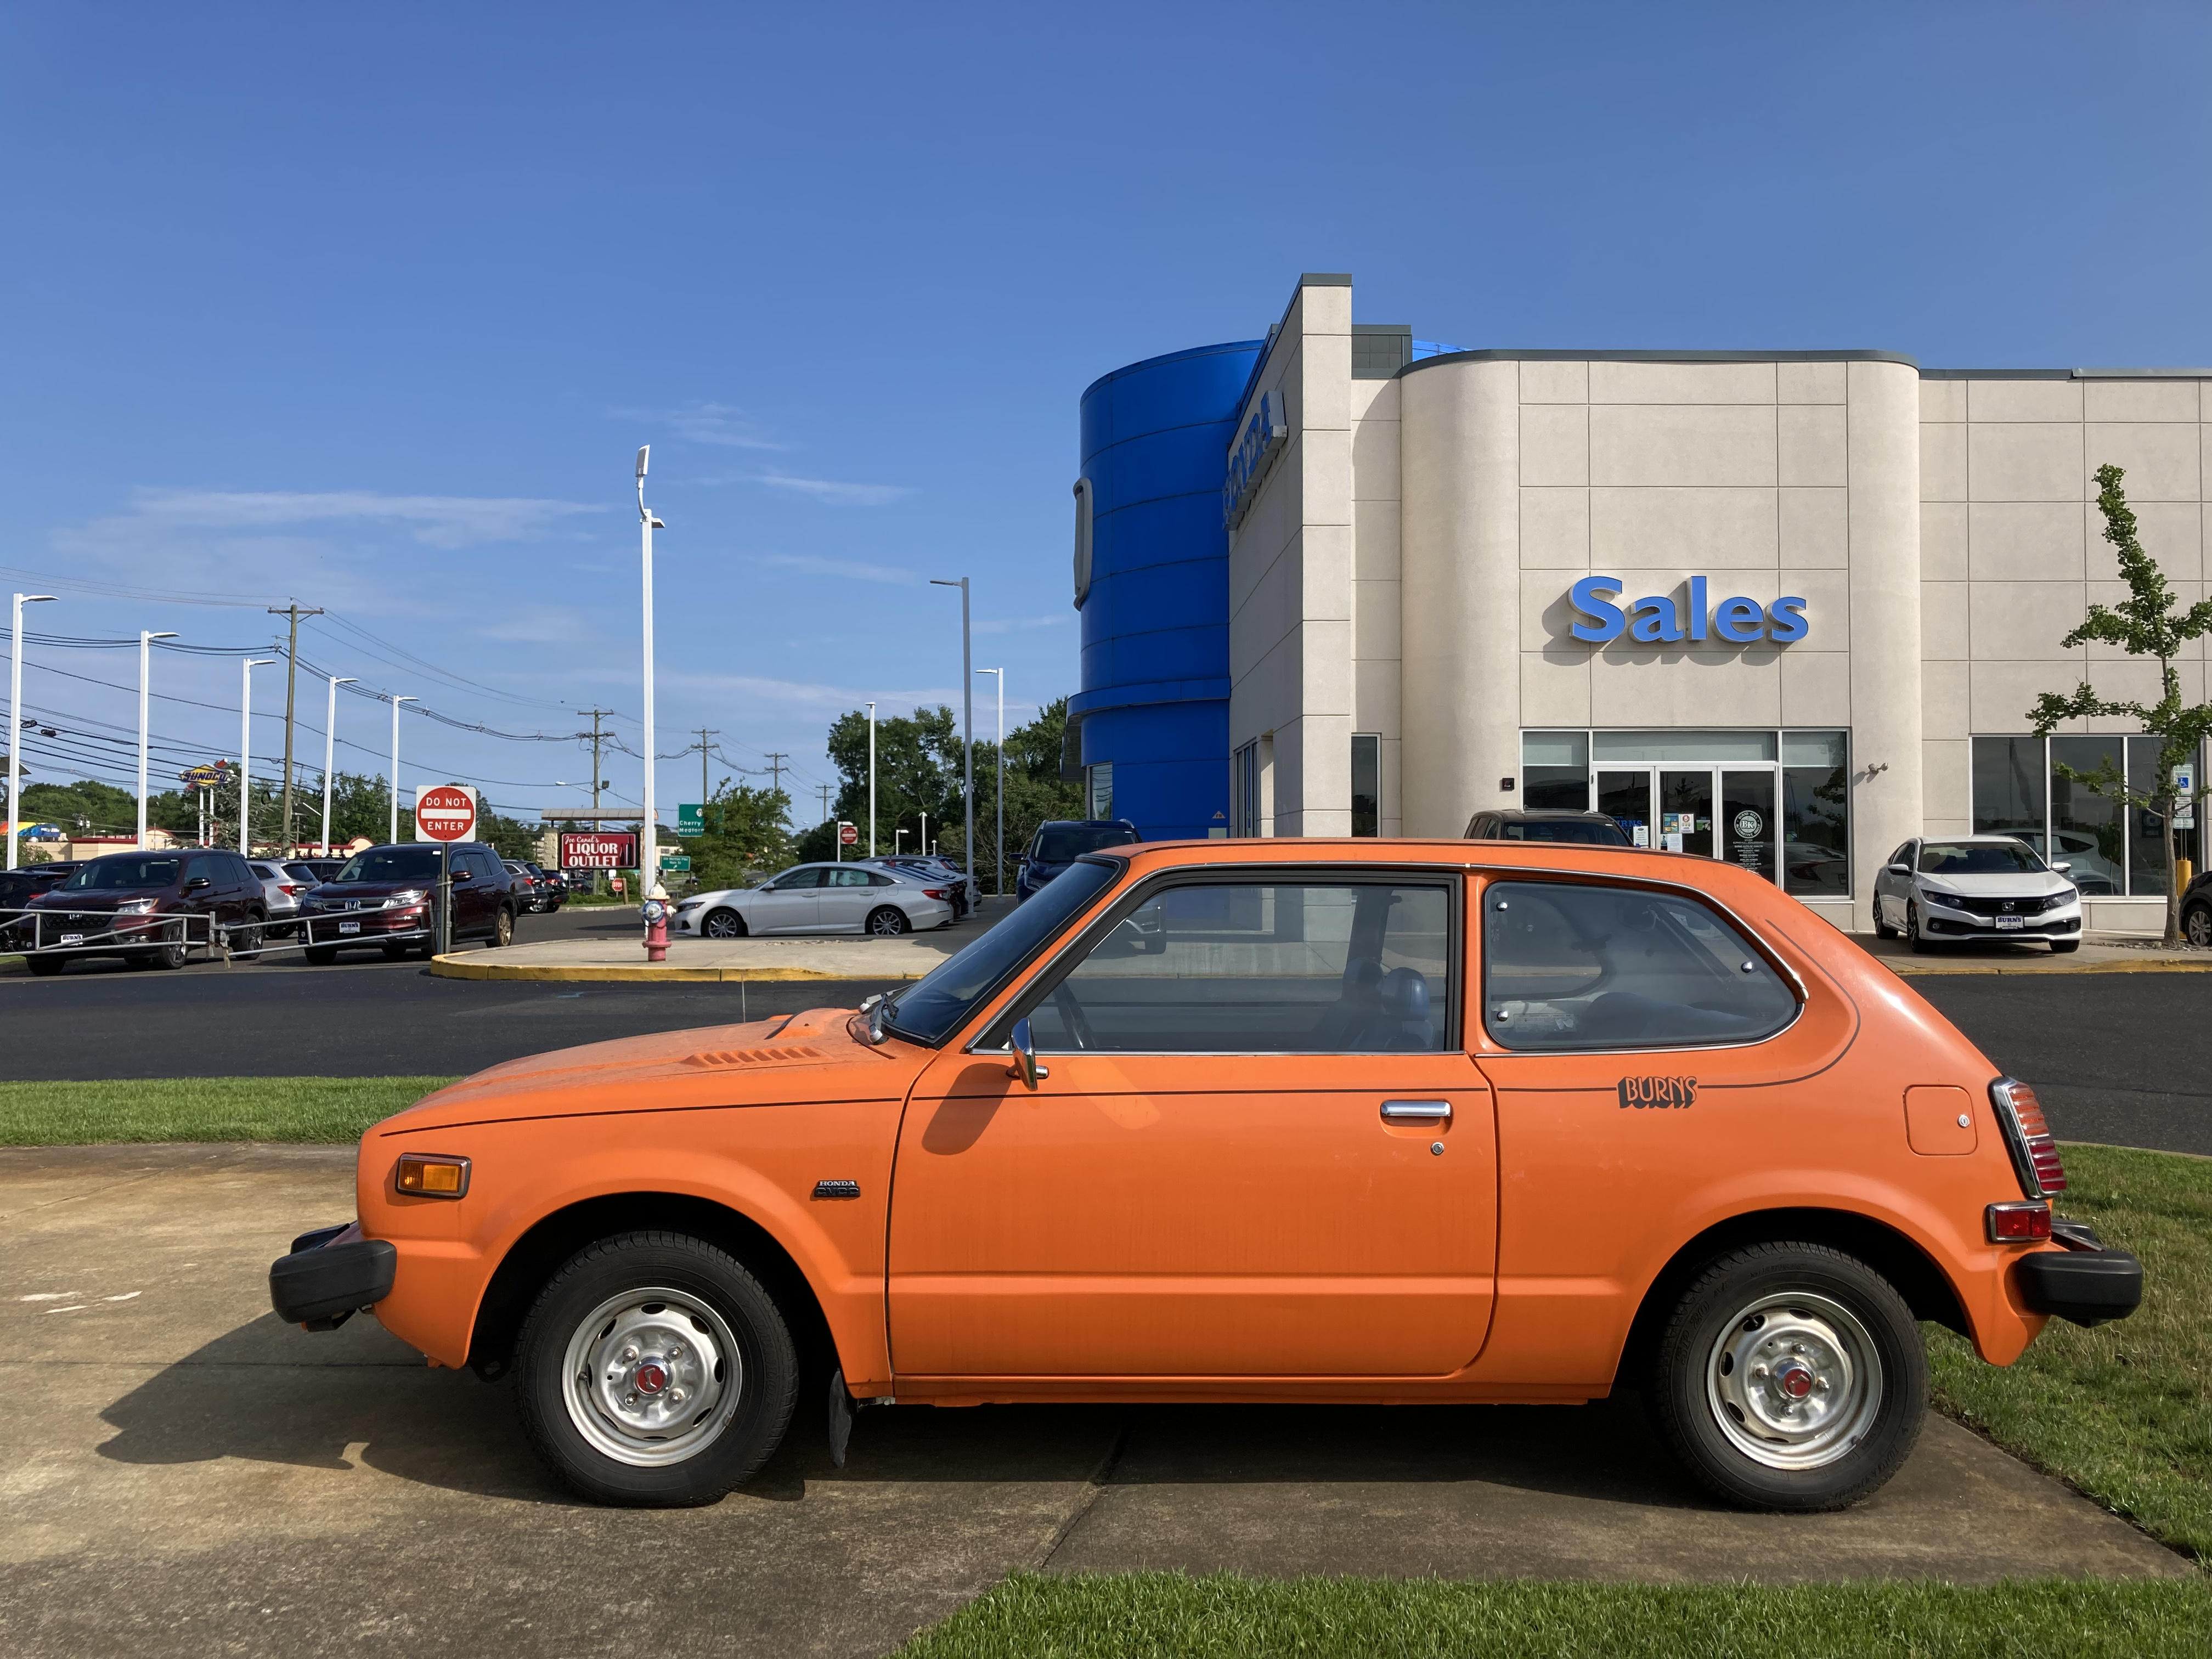 First-generation Honda Civic parked outside of Burns Honda.